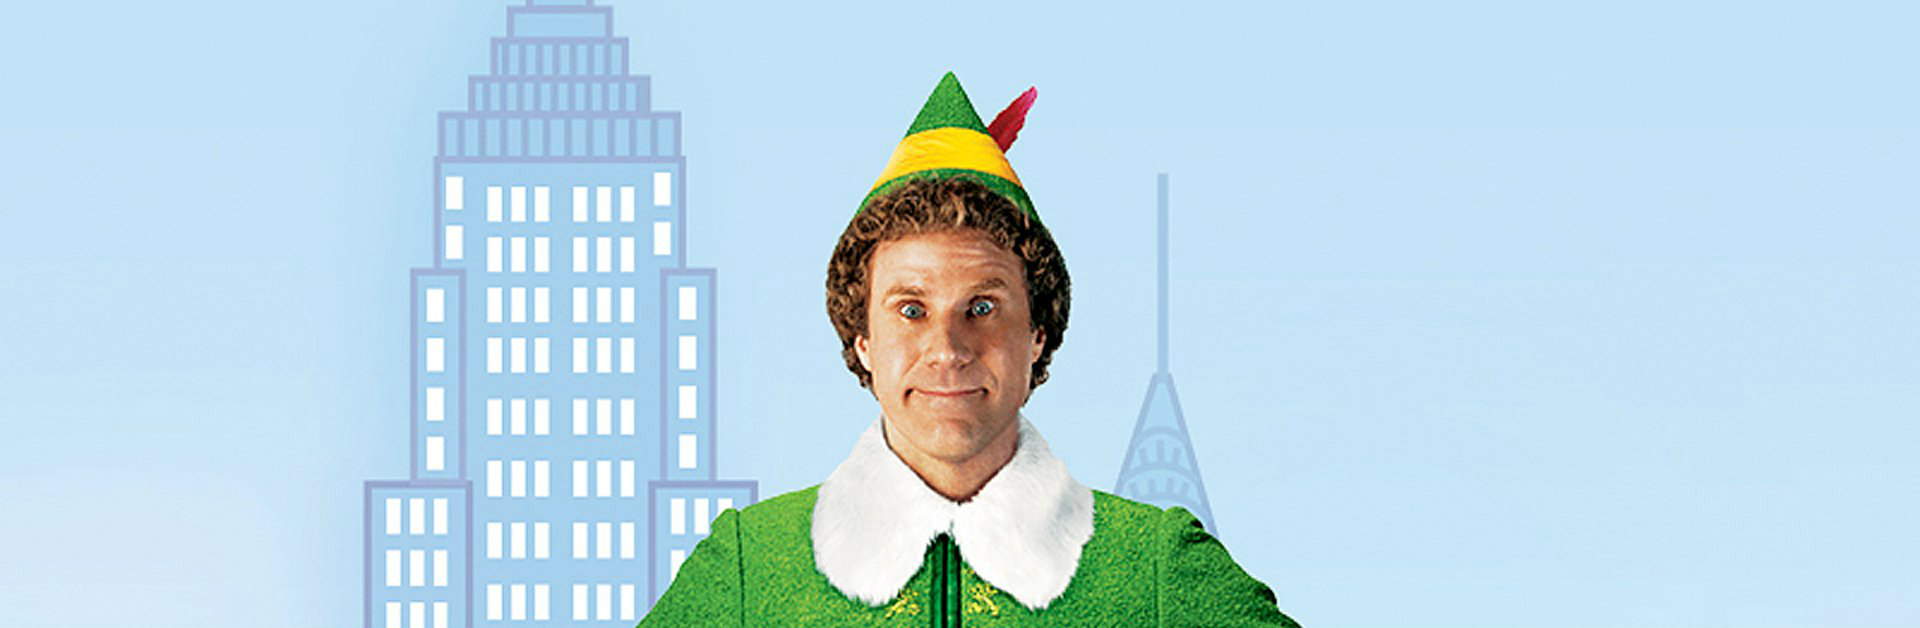 Elf 2 | Sequel | Will Ferrell | Best British Podcasts